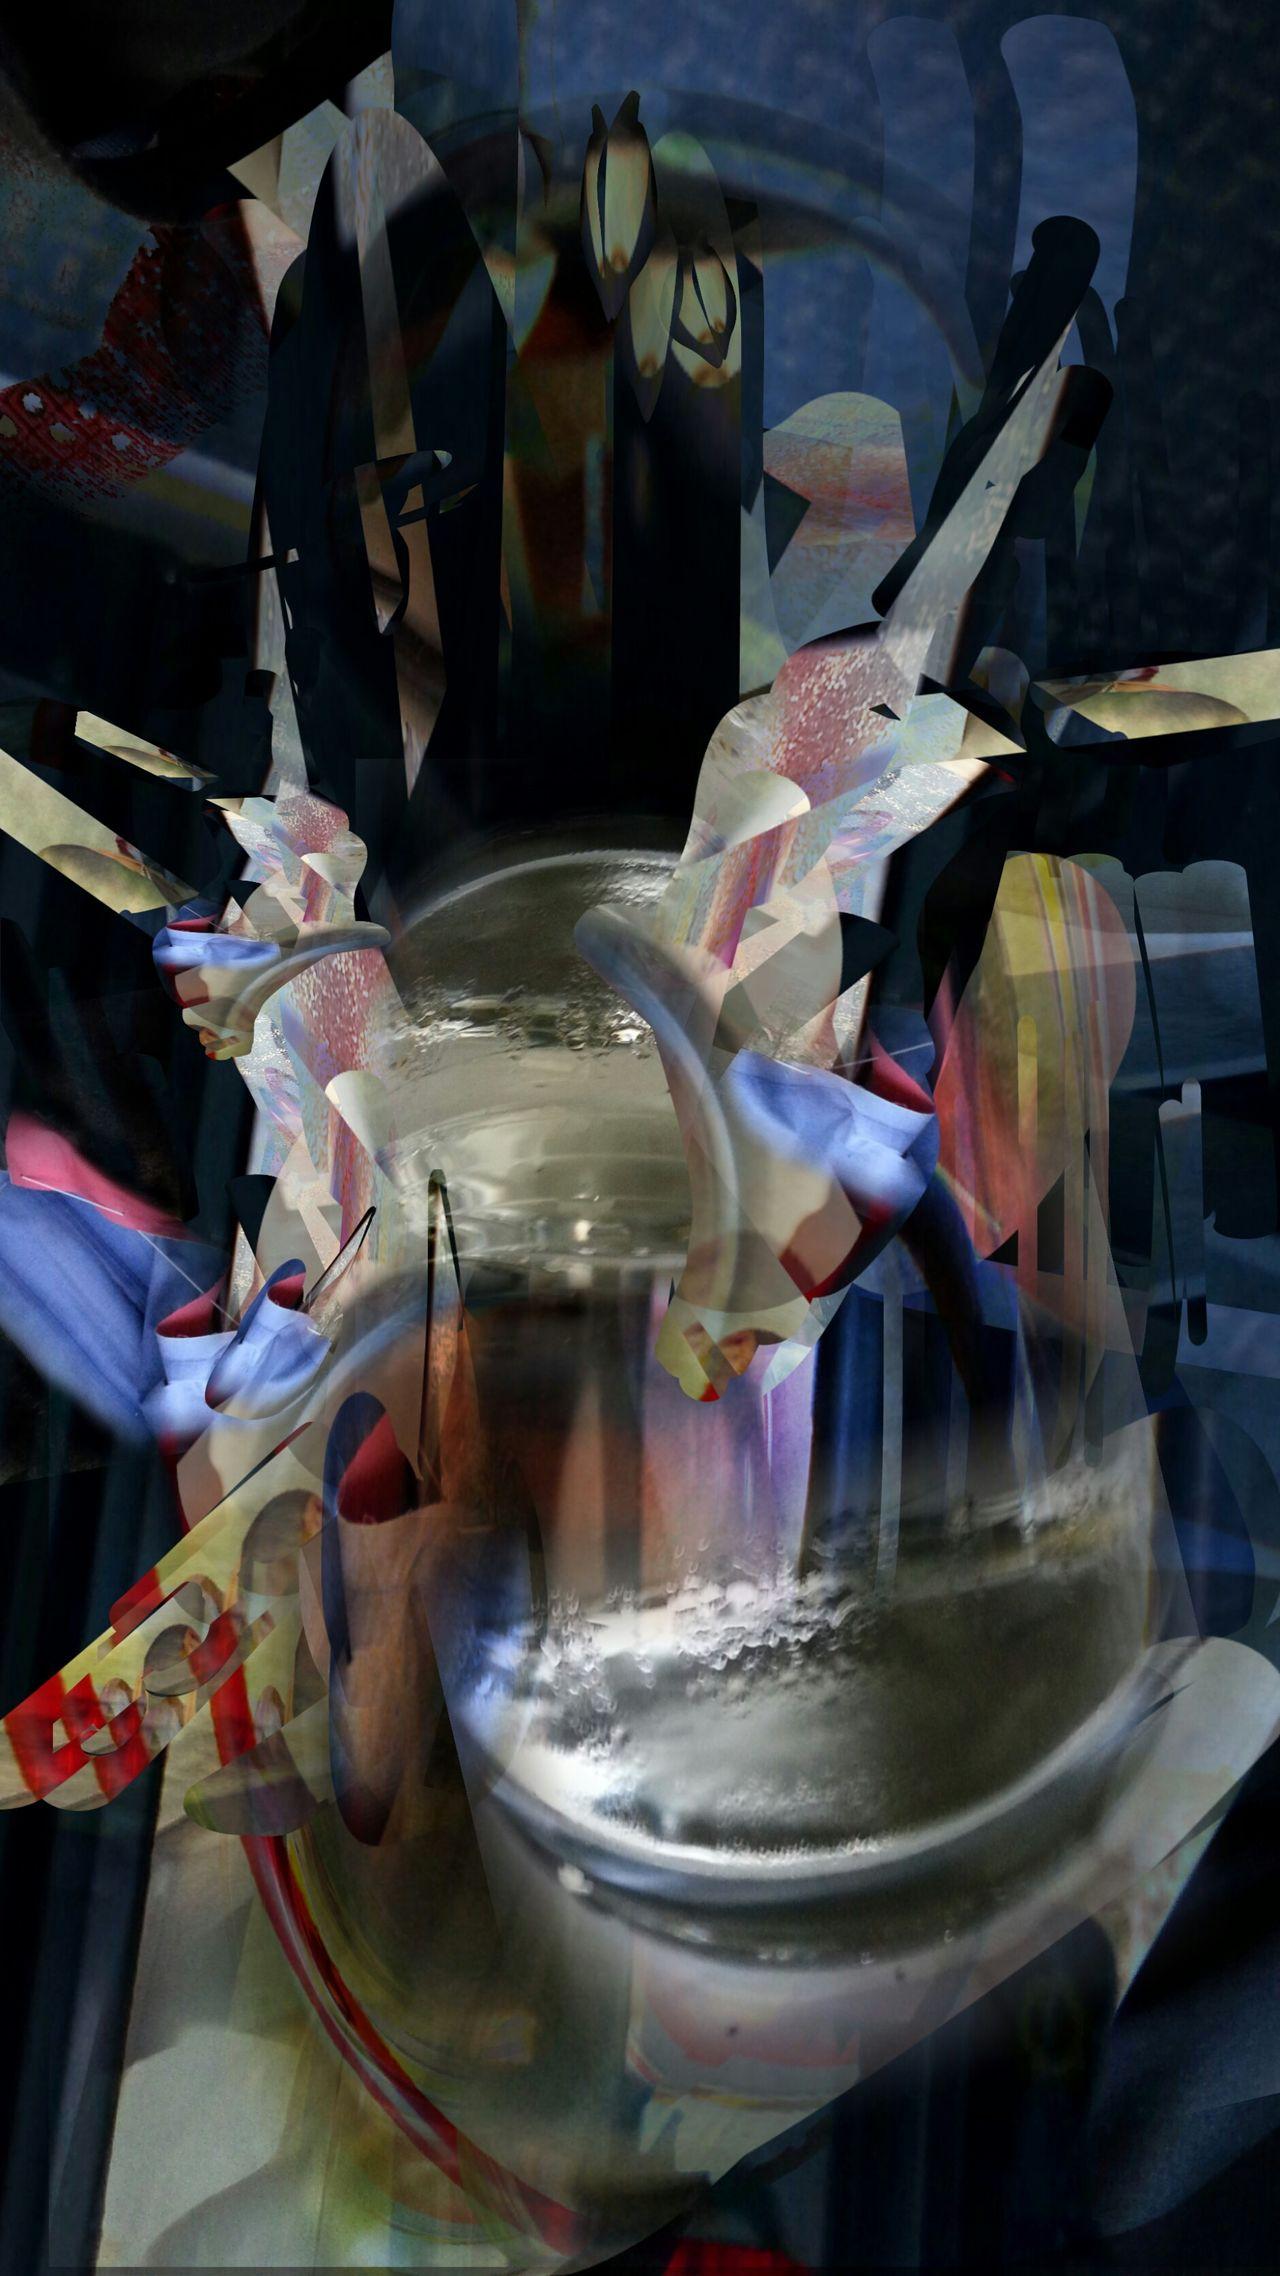 Utopischer Horizont Light And Shadow Digital Art Art, Drawing, Creativity Creating Memories Architecture ✨{To See Is A Movement Of Life Circulating Within Us Before Objects, Before Any Outside Détermination... Jacques Lusseyran} .../... Au Cœur Du Temps ✨{Voir, C'est Un Mouvement De La Vie Fait En Nous Avant Les Objets, Avant Toute Détermination Extérieure.. New Reality Ymoart Hello World Mobile Artistry